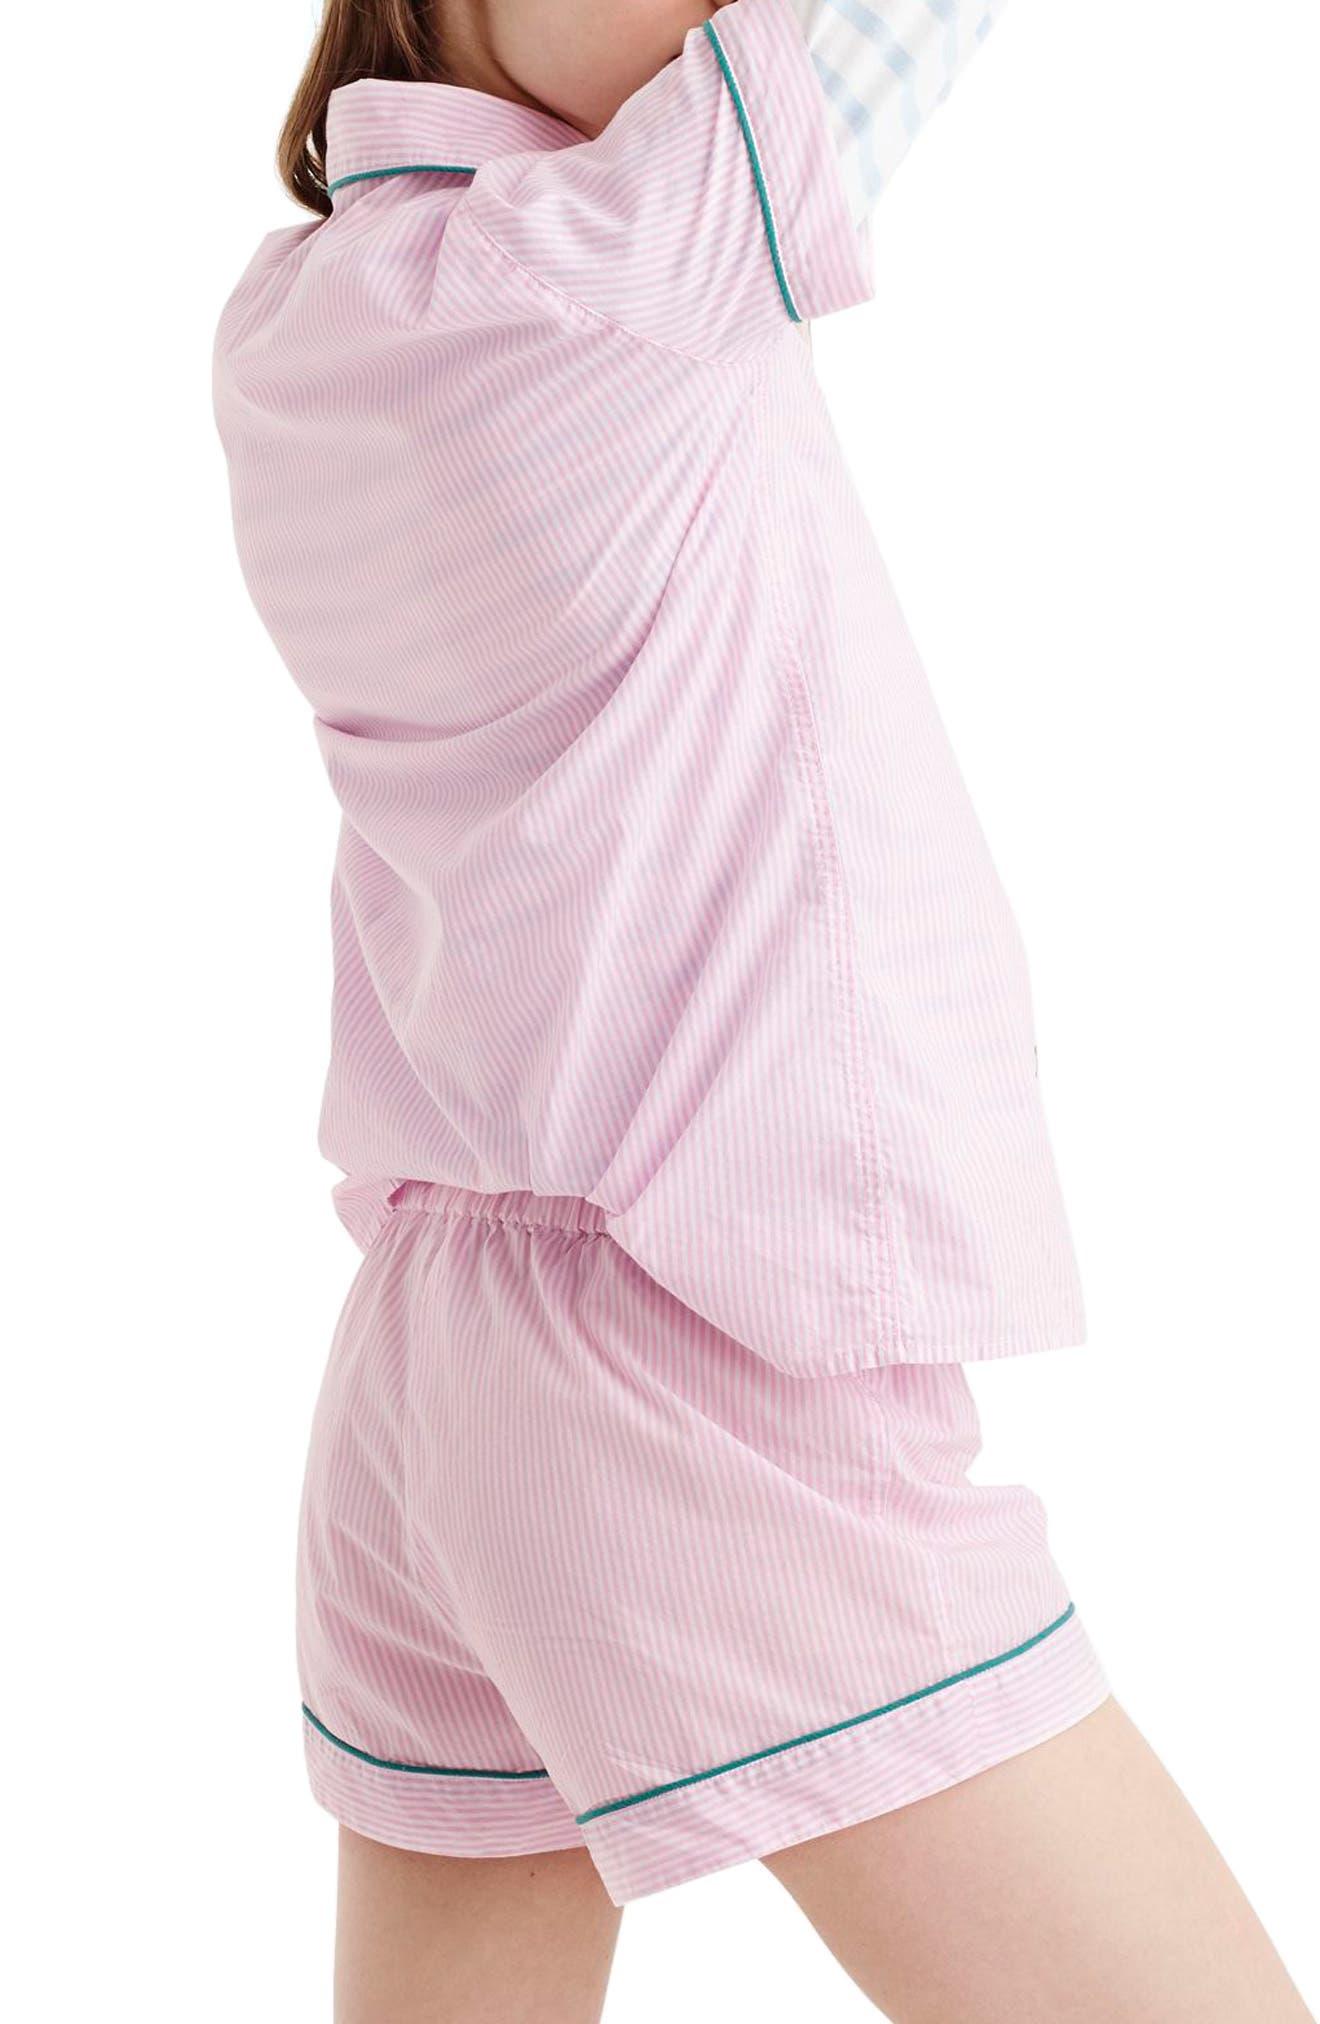 Tipped Short Pajamas,                             Alternate thumbnail 2, color,                             White Hibiscus